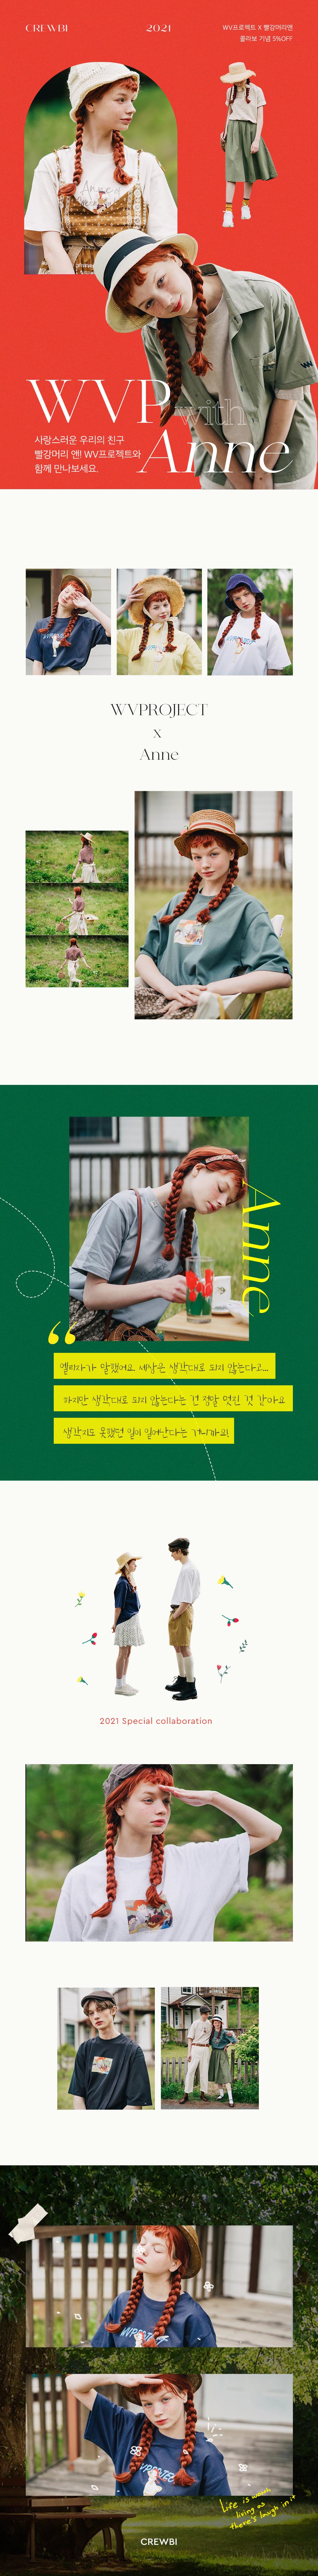 WVP X ANNE 콜라보레이션